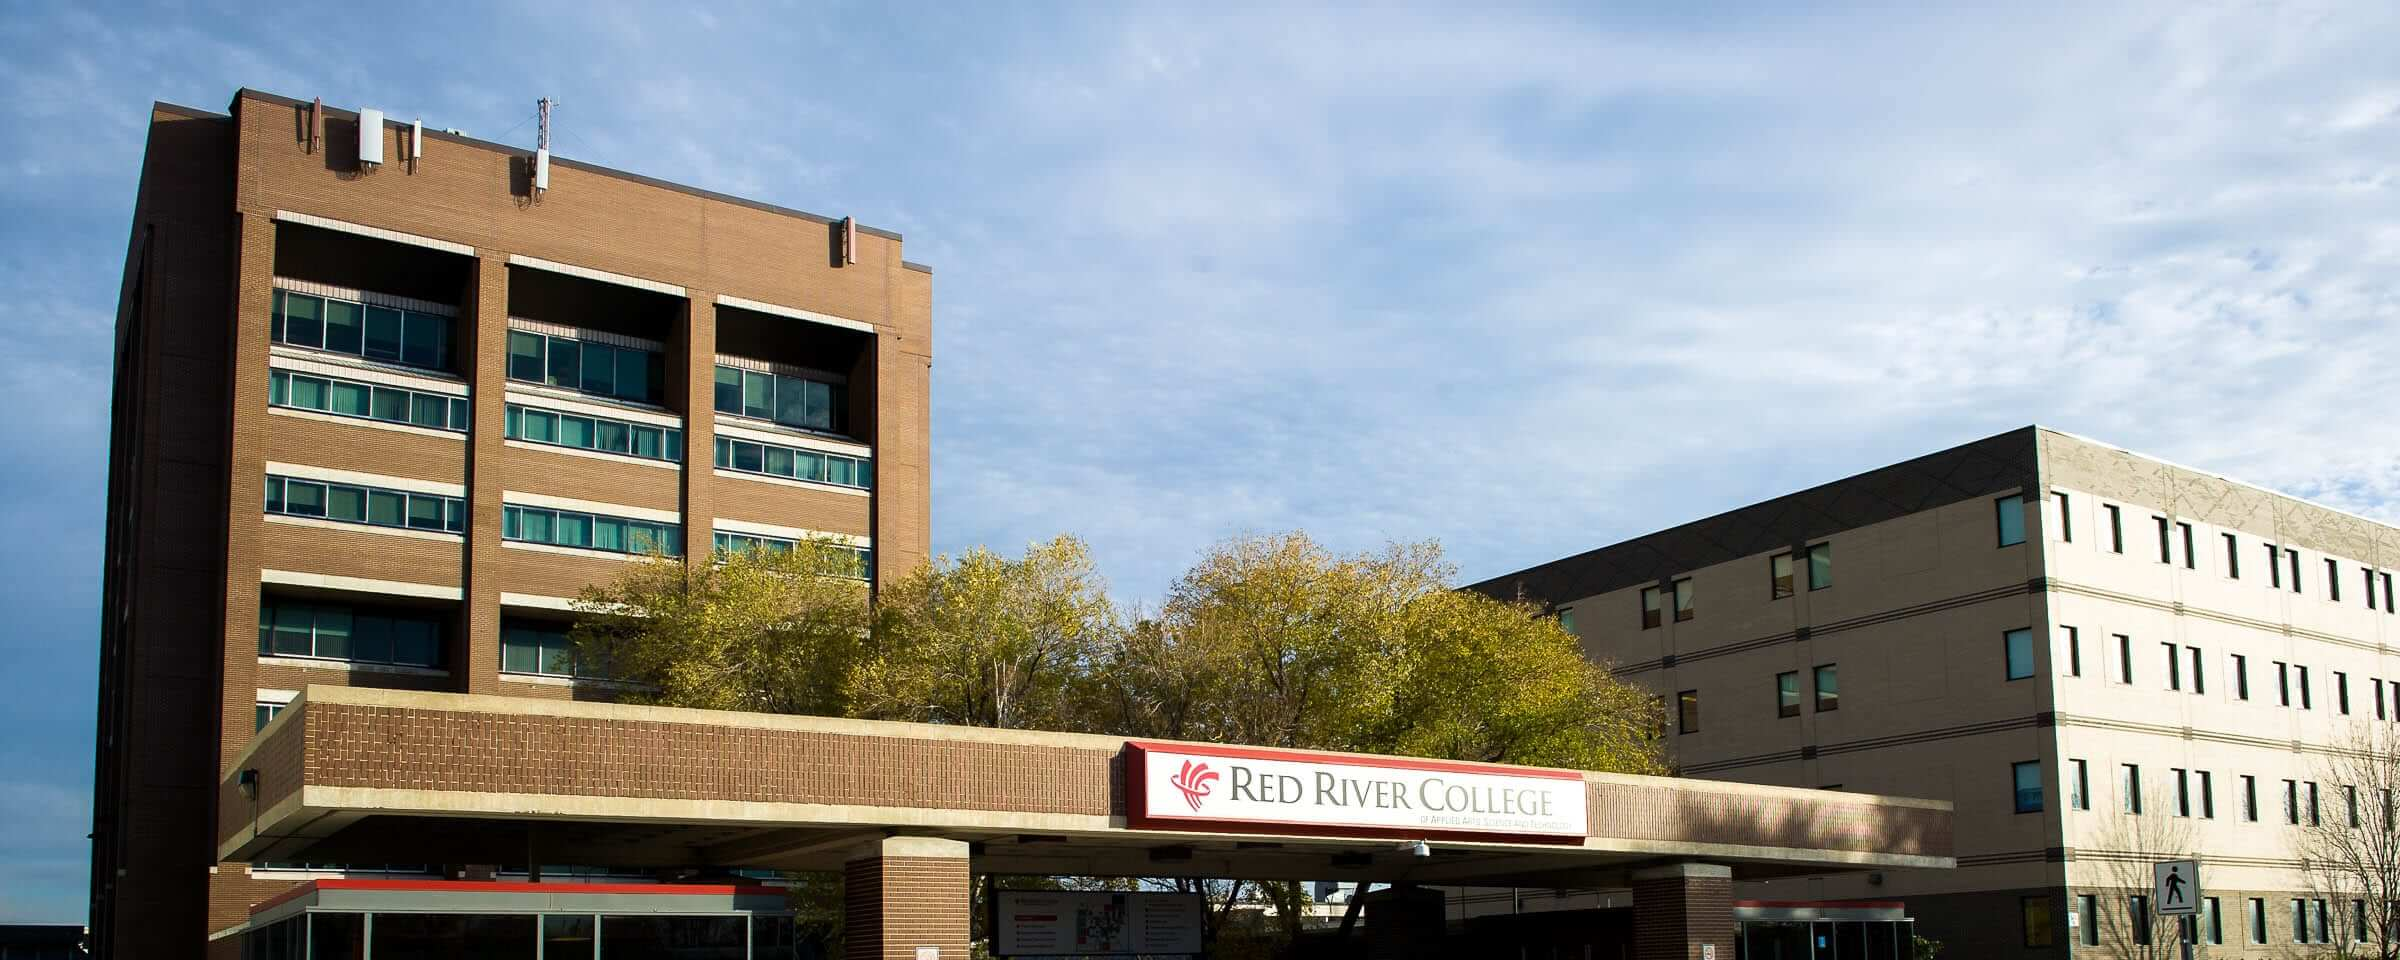 RRC-Notre-Campuses